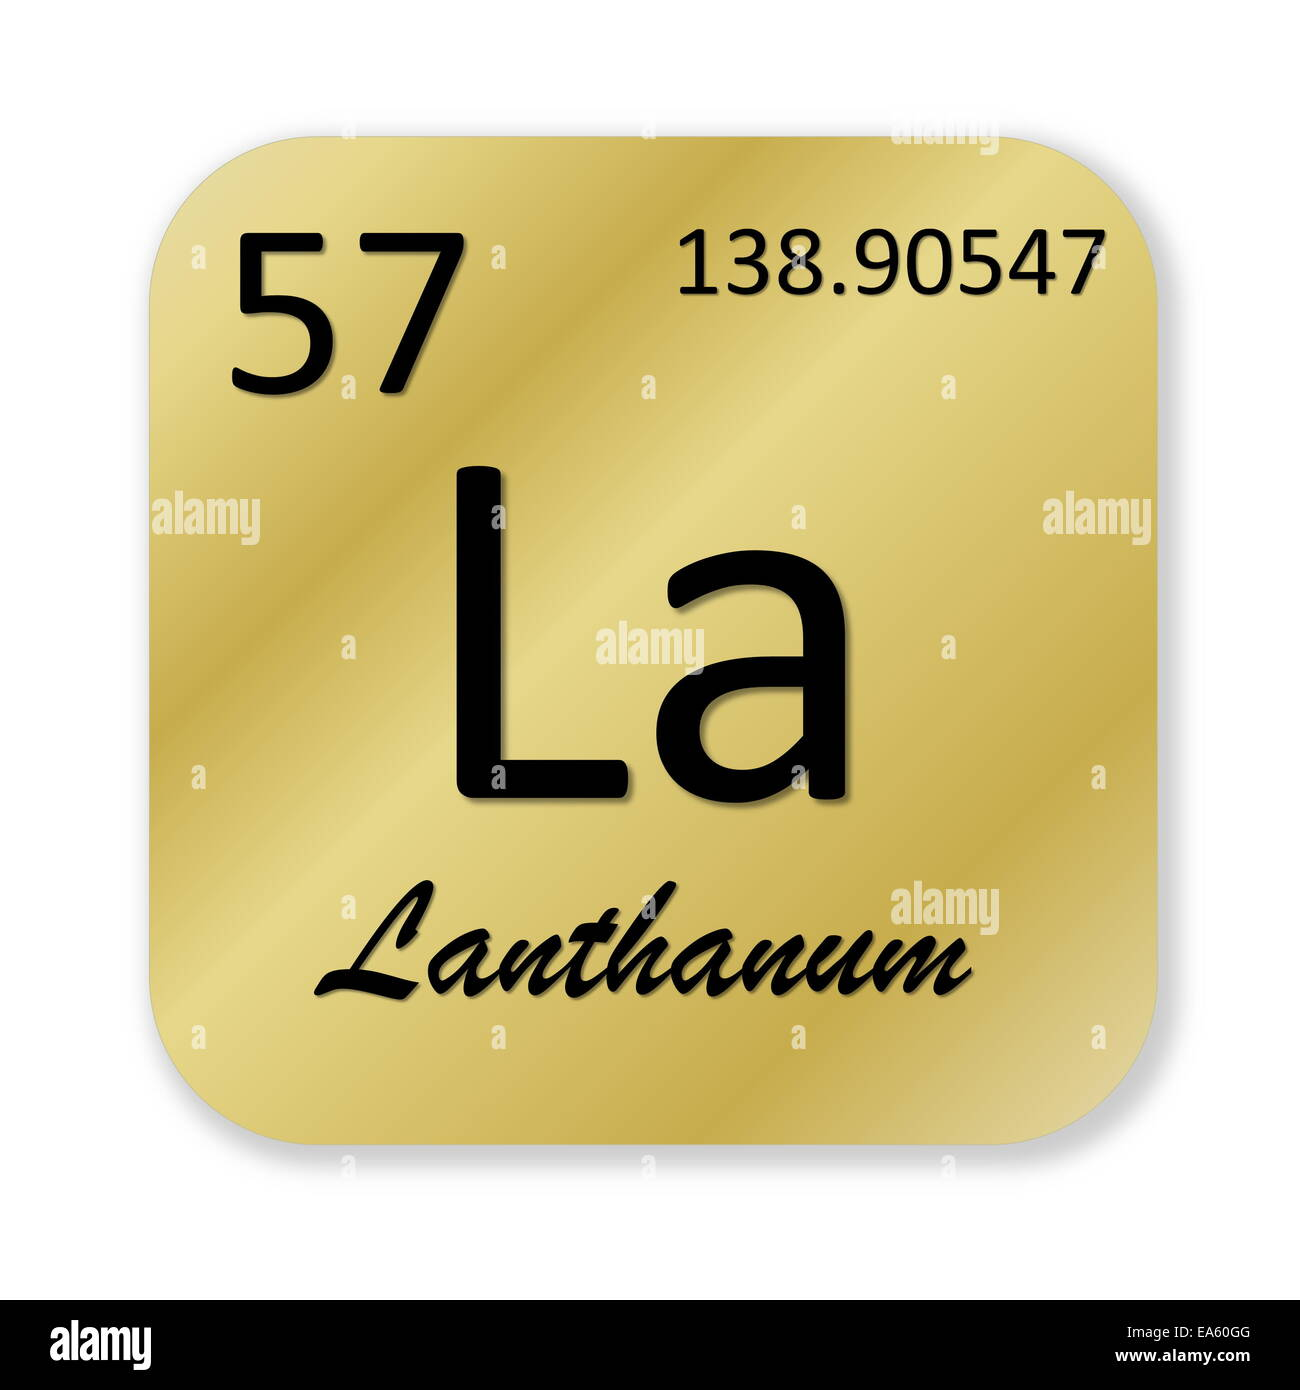 Lanthanum element stock photo royalty free image 75120208 alamy lanthanum element gamestrikefo Gallery